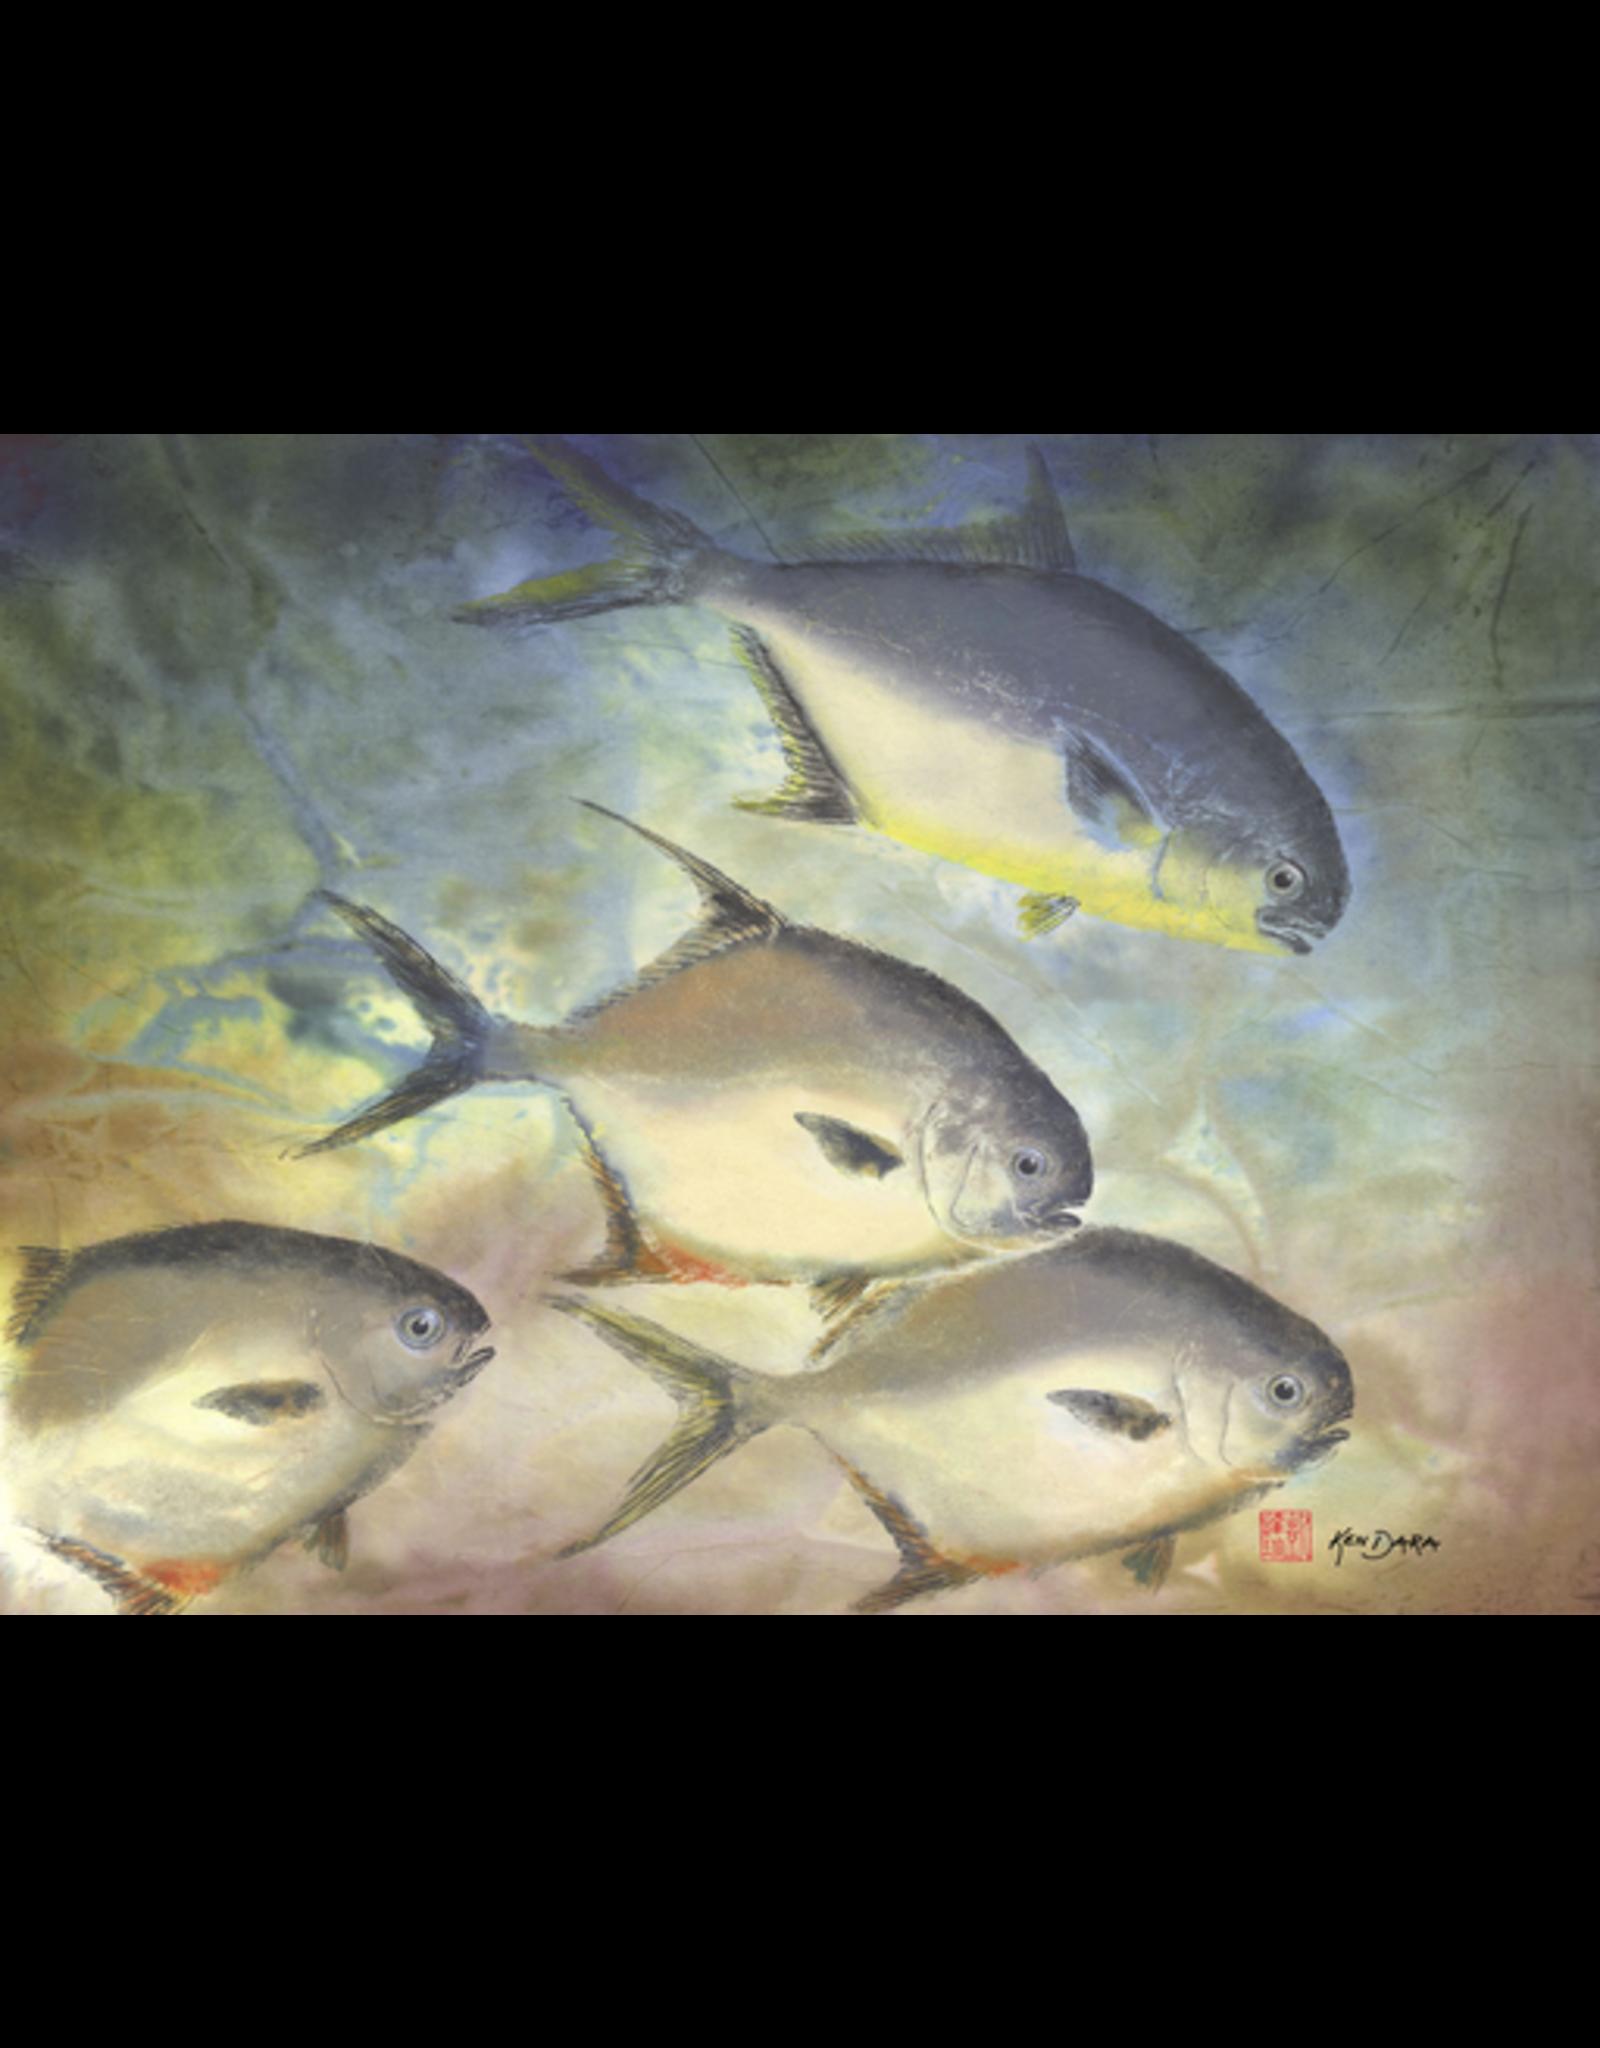 Ken Dara POMPANO (Gyotaku Giclee on Watercolor Paper, 22x24, Framed, Signed, KEND)